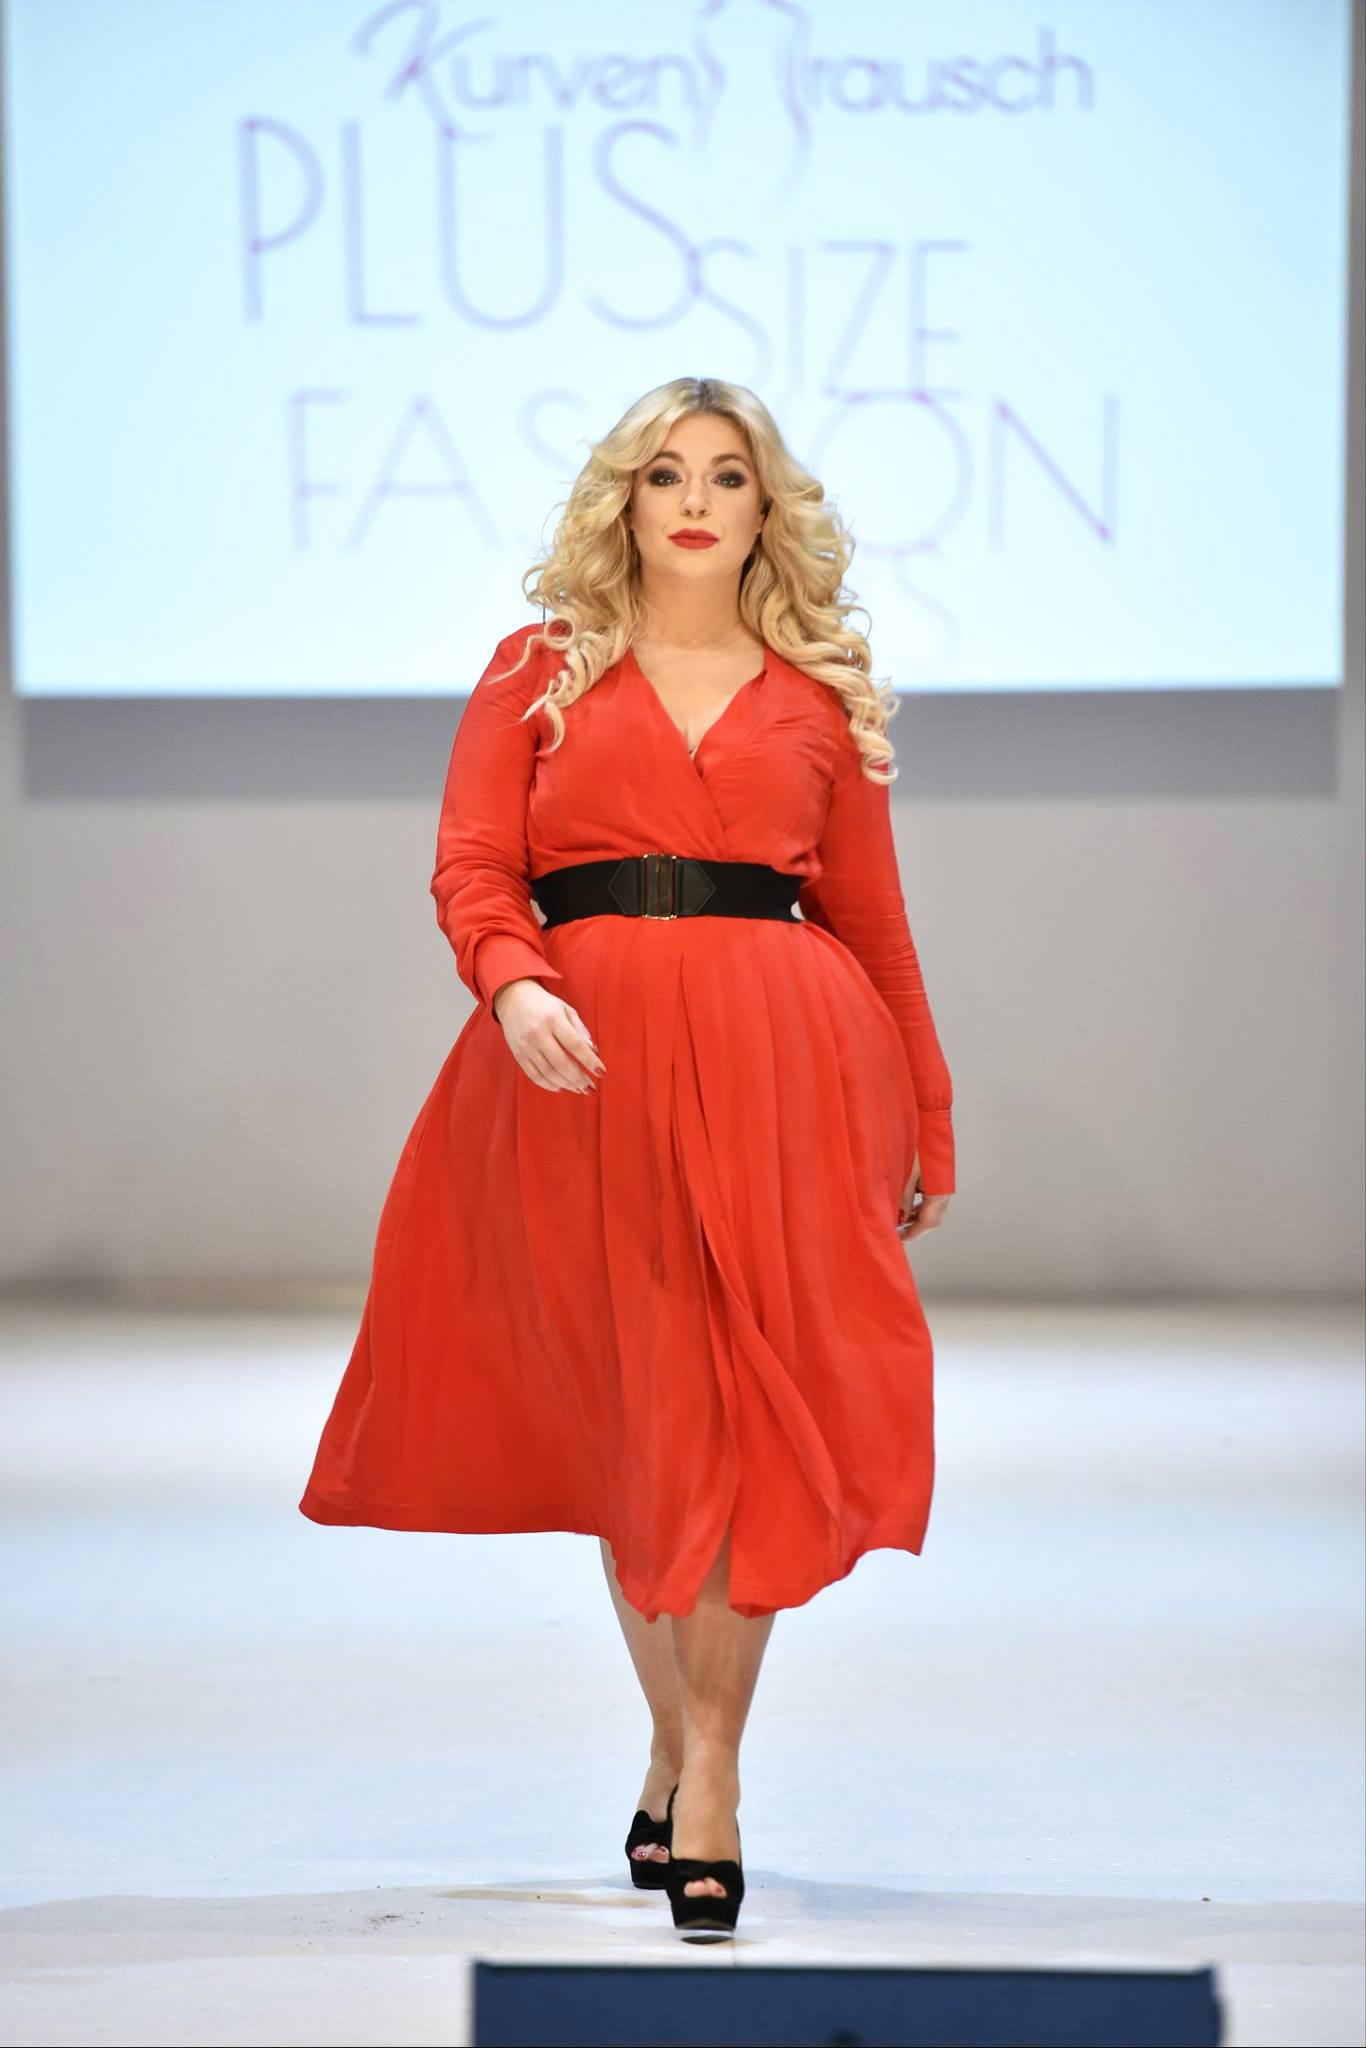 megabambi-Fashionbloh-Plussizemodel-caterina-pogorzelski-Modeljob-Plussizemodel-curvymodel